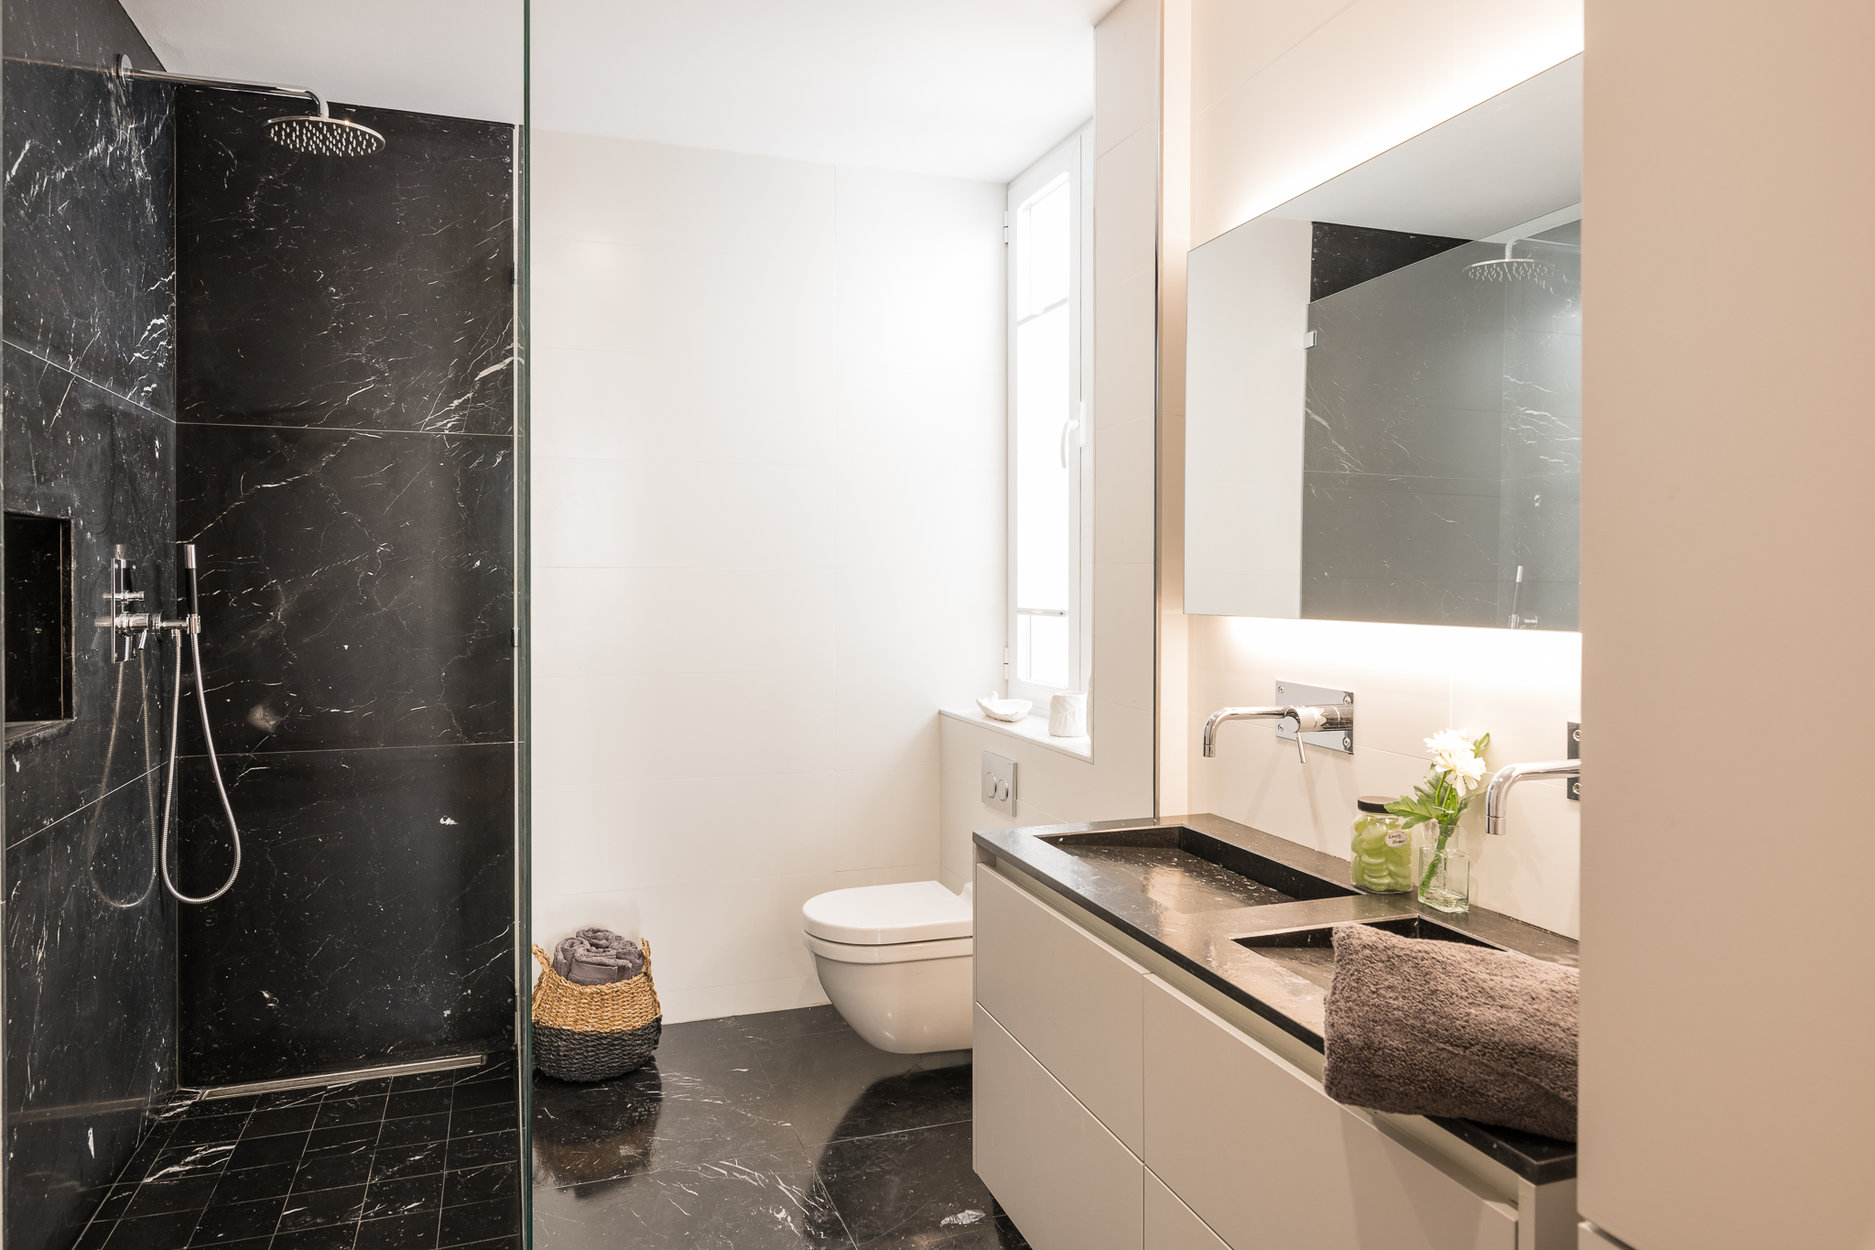 bathroom design center 3. Plain Center Previous Next Inside Bathroom Design Center 3